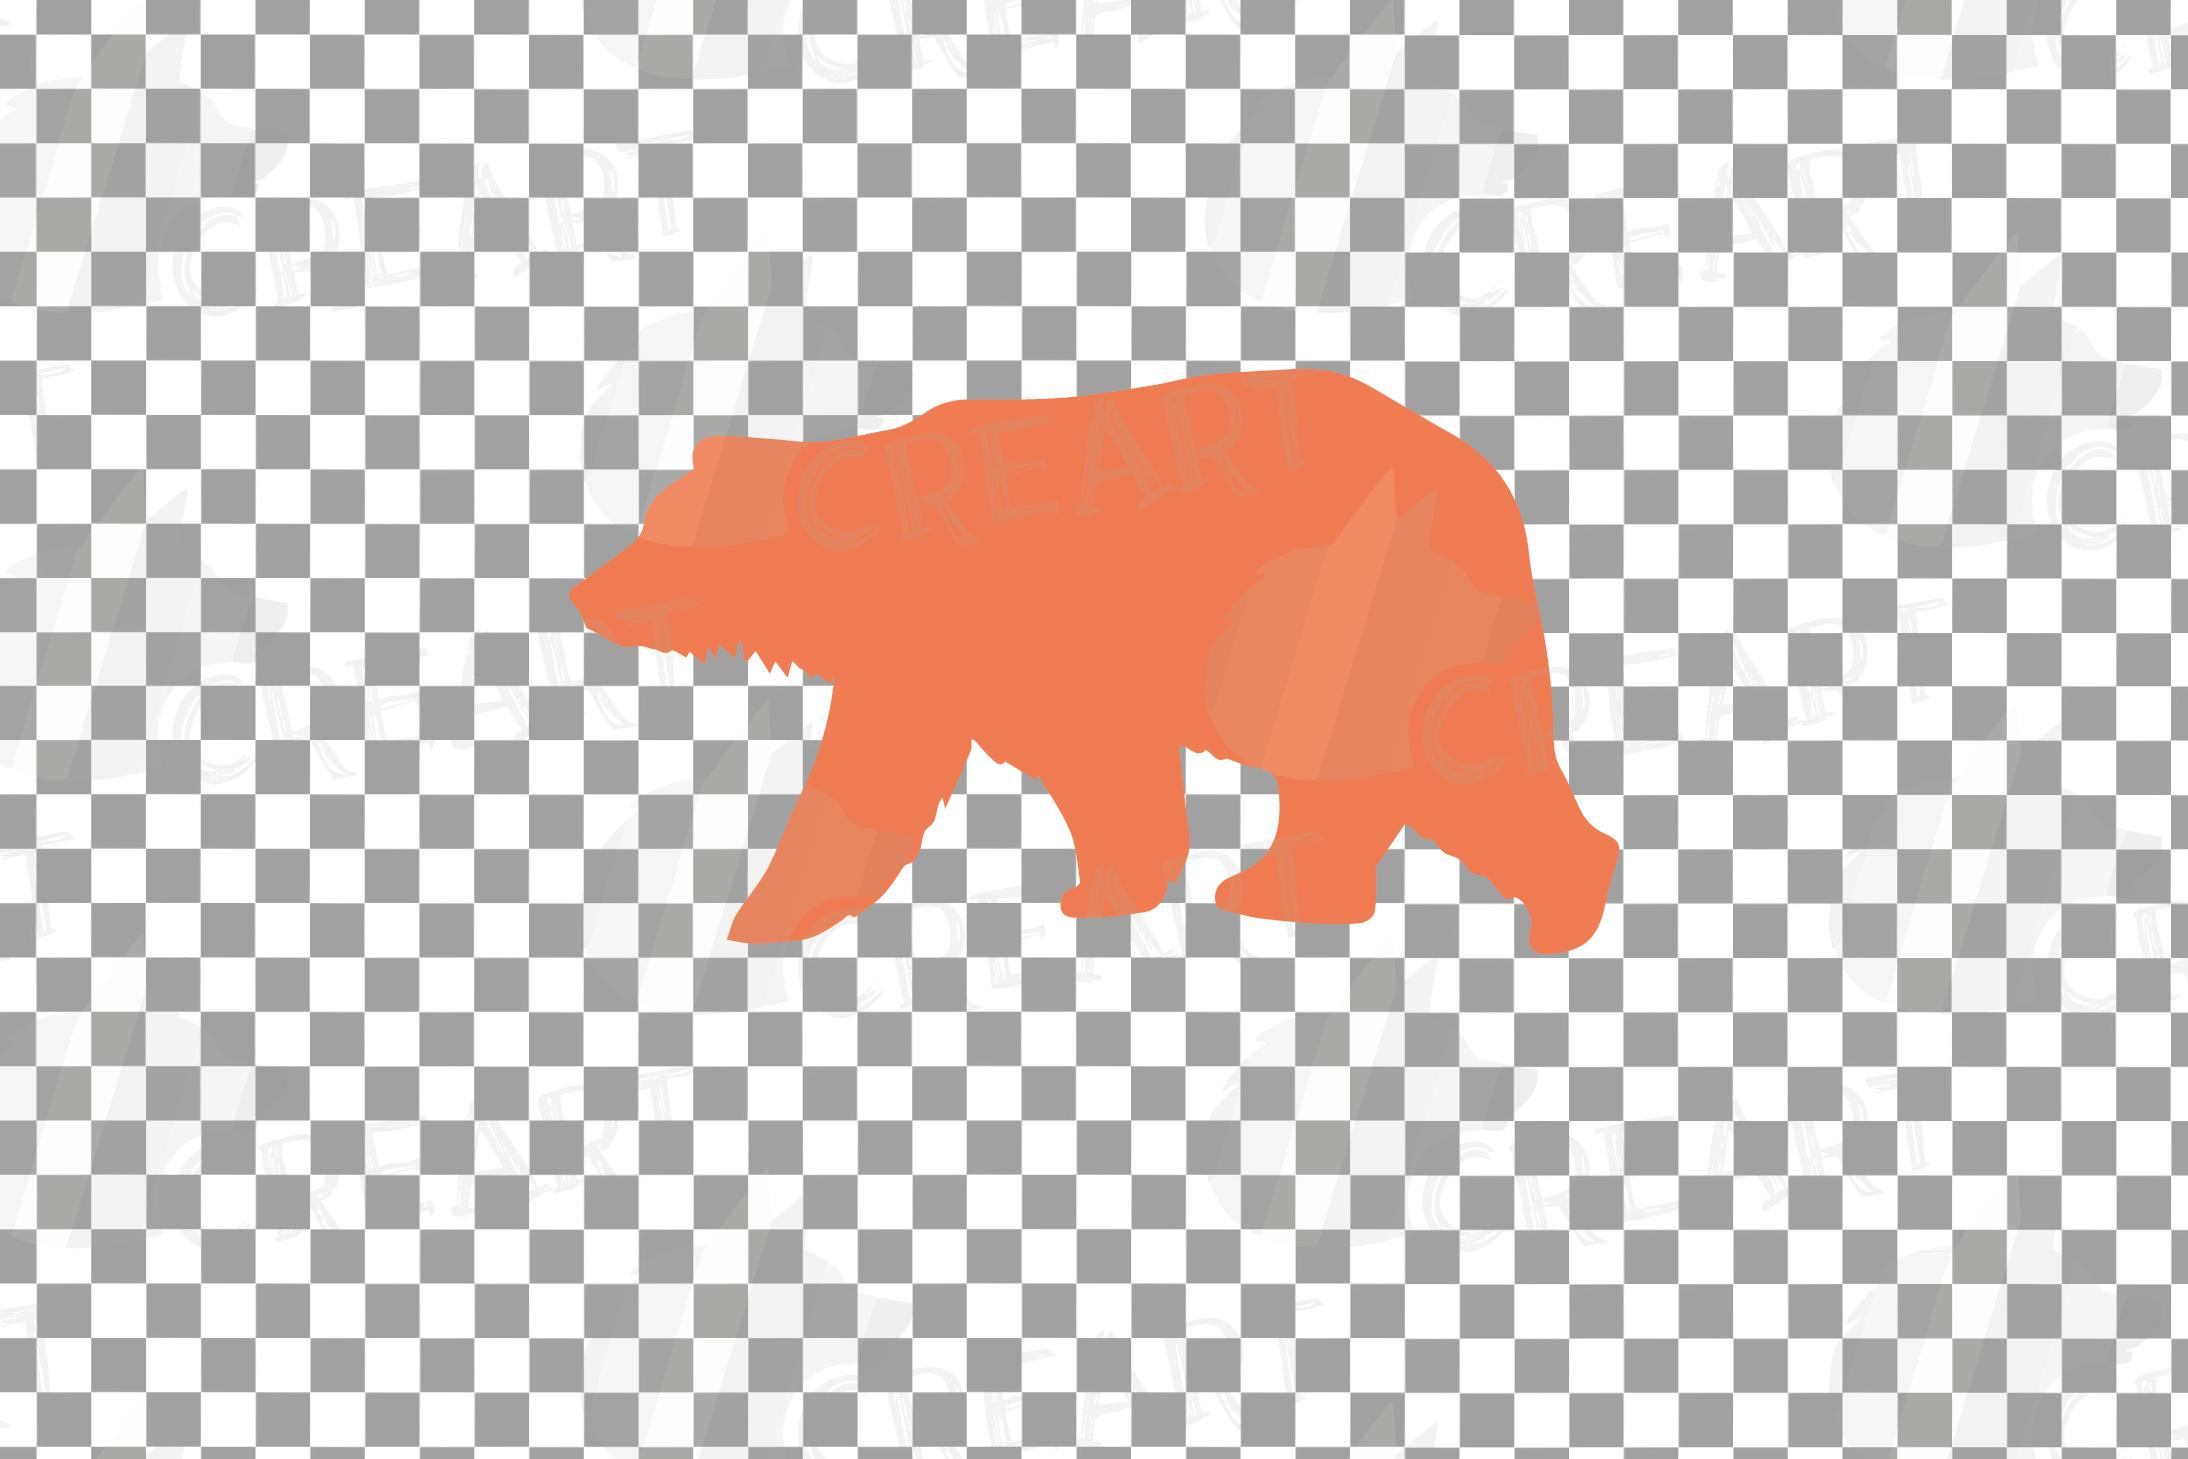 Baby and mama bear nursery clip art collection, bears print example image 8